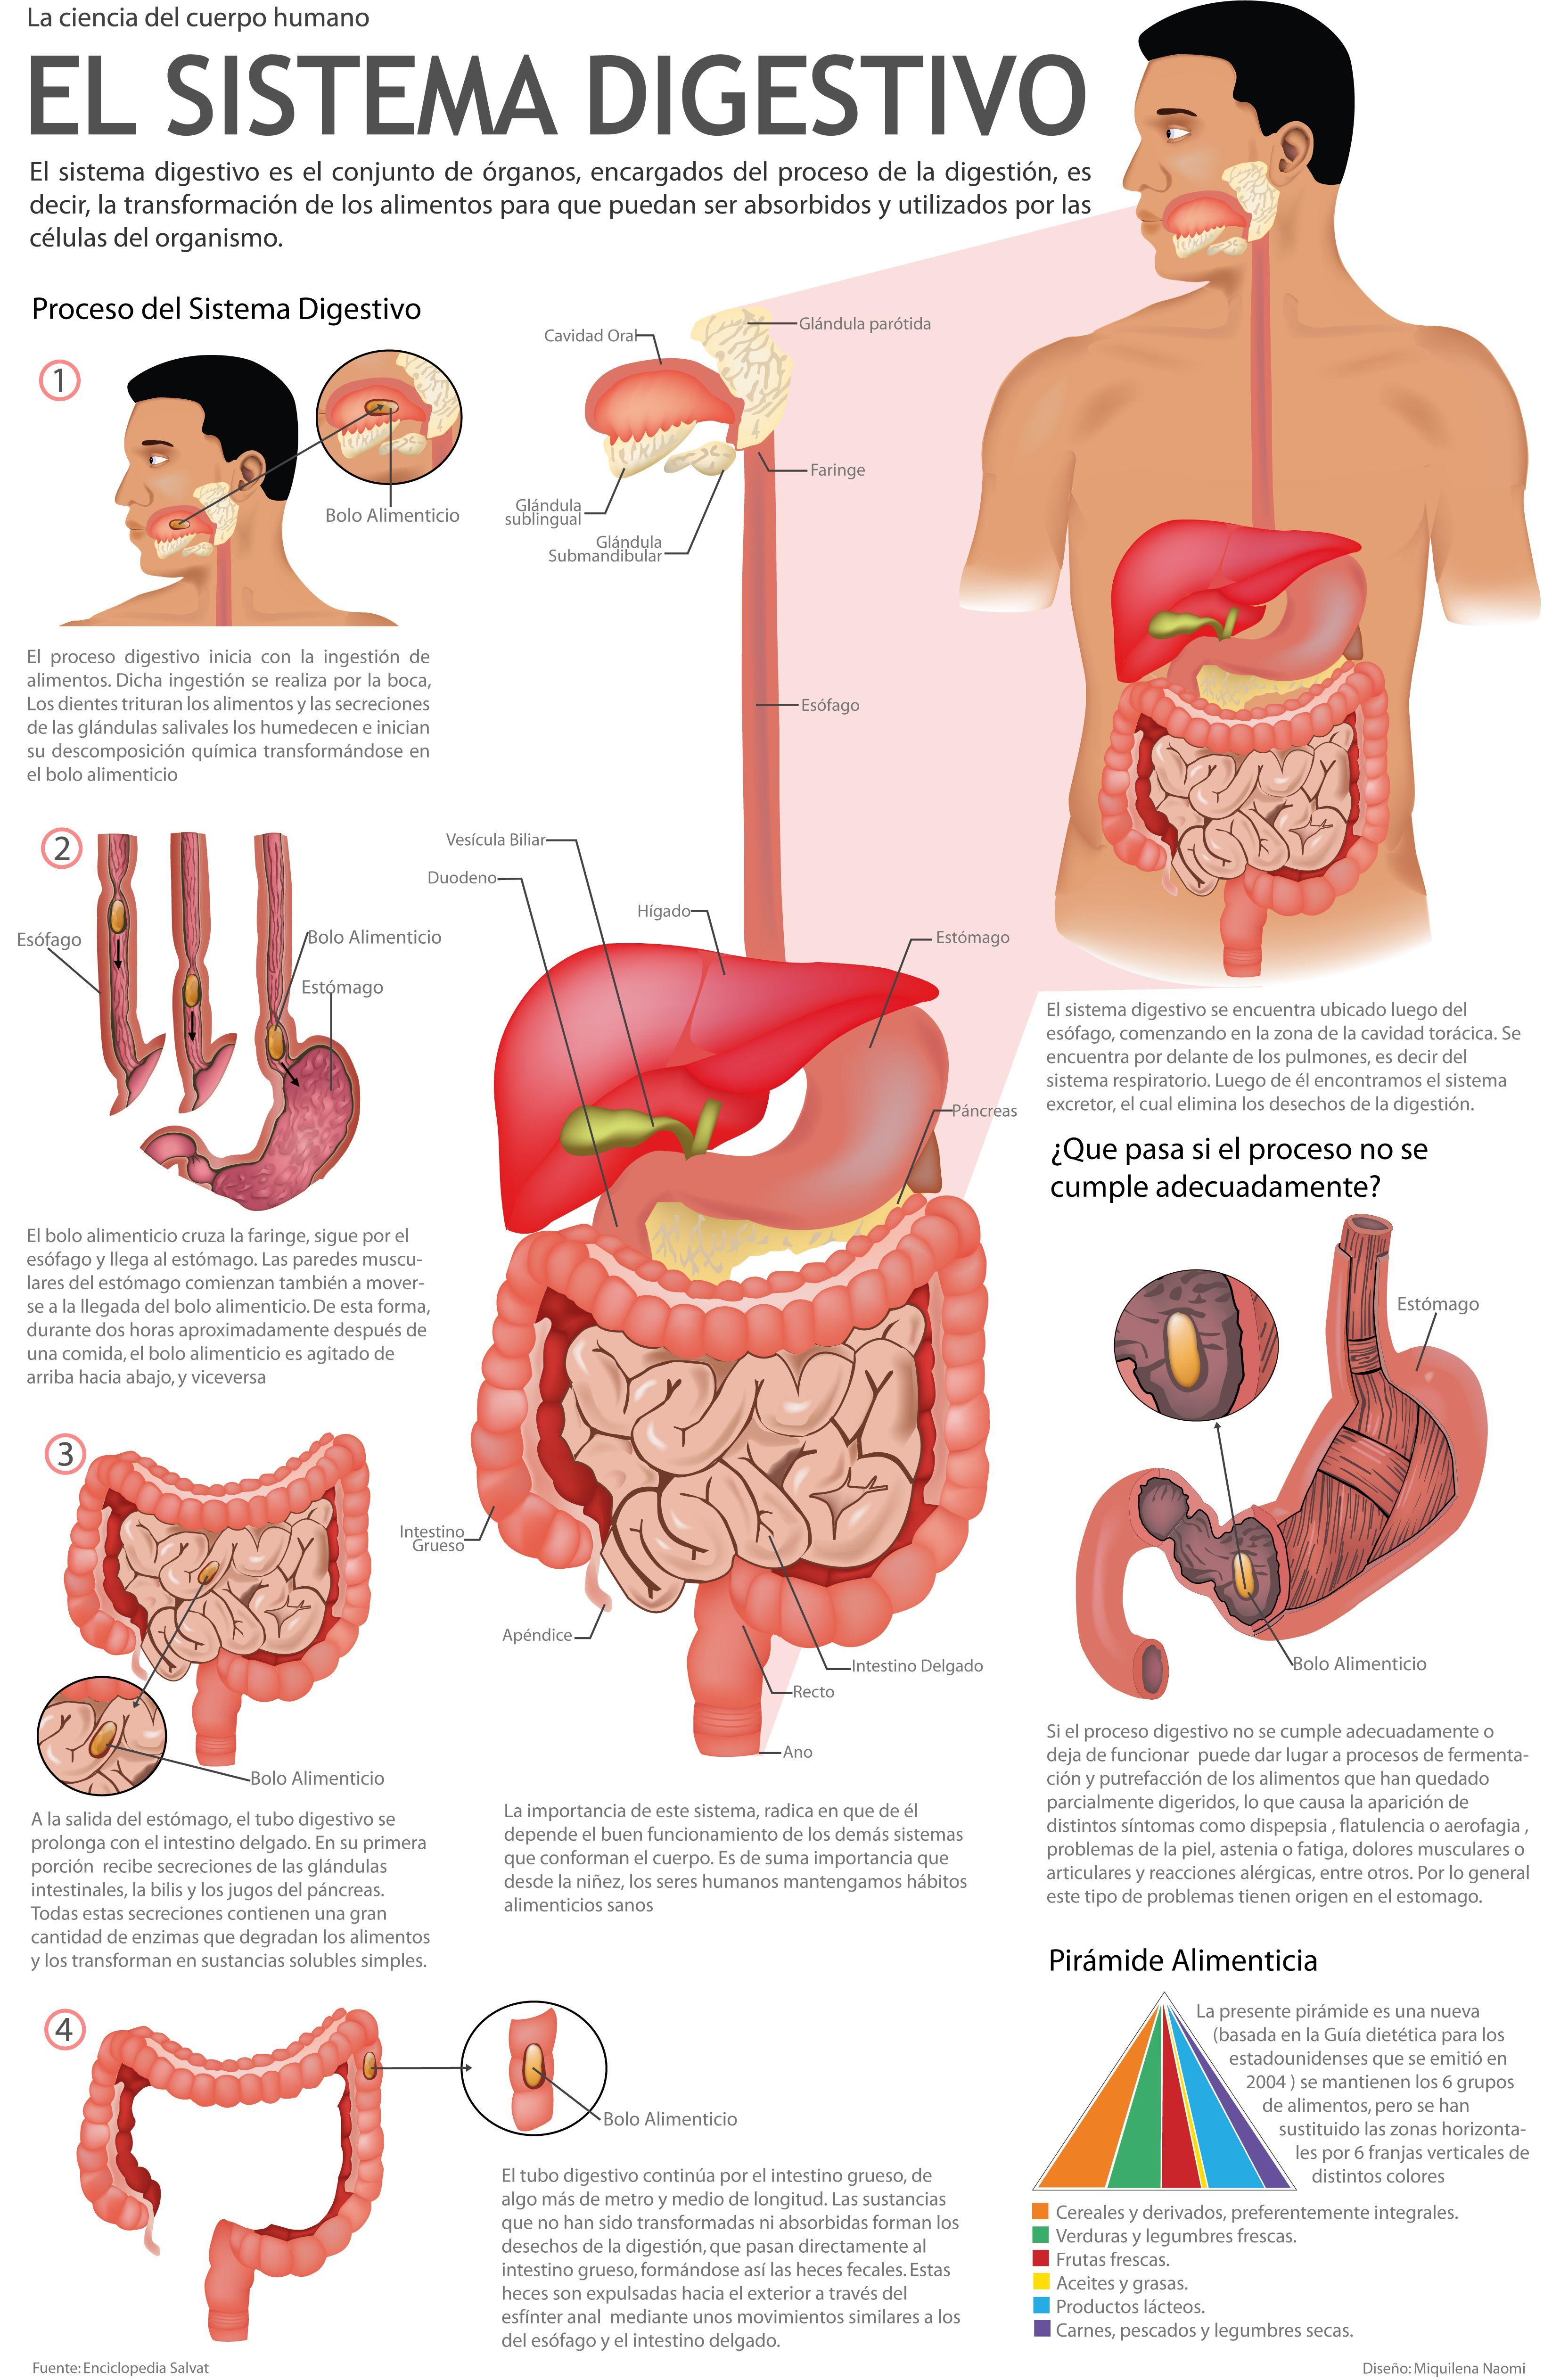 Sistemadigestivo Infografia Infographic Vectores Diseñografico Anatomia Y Fisiologia Humana Anatomia Y Fisiologia Anatomía Médica